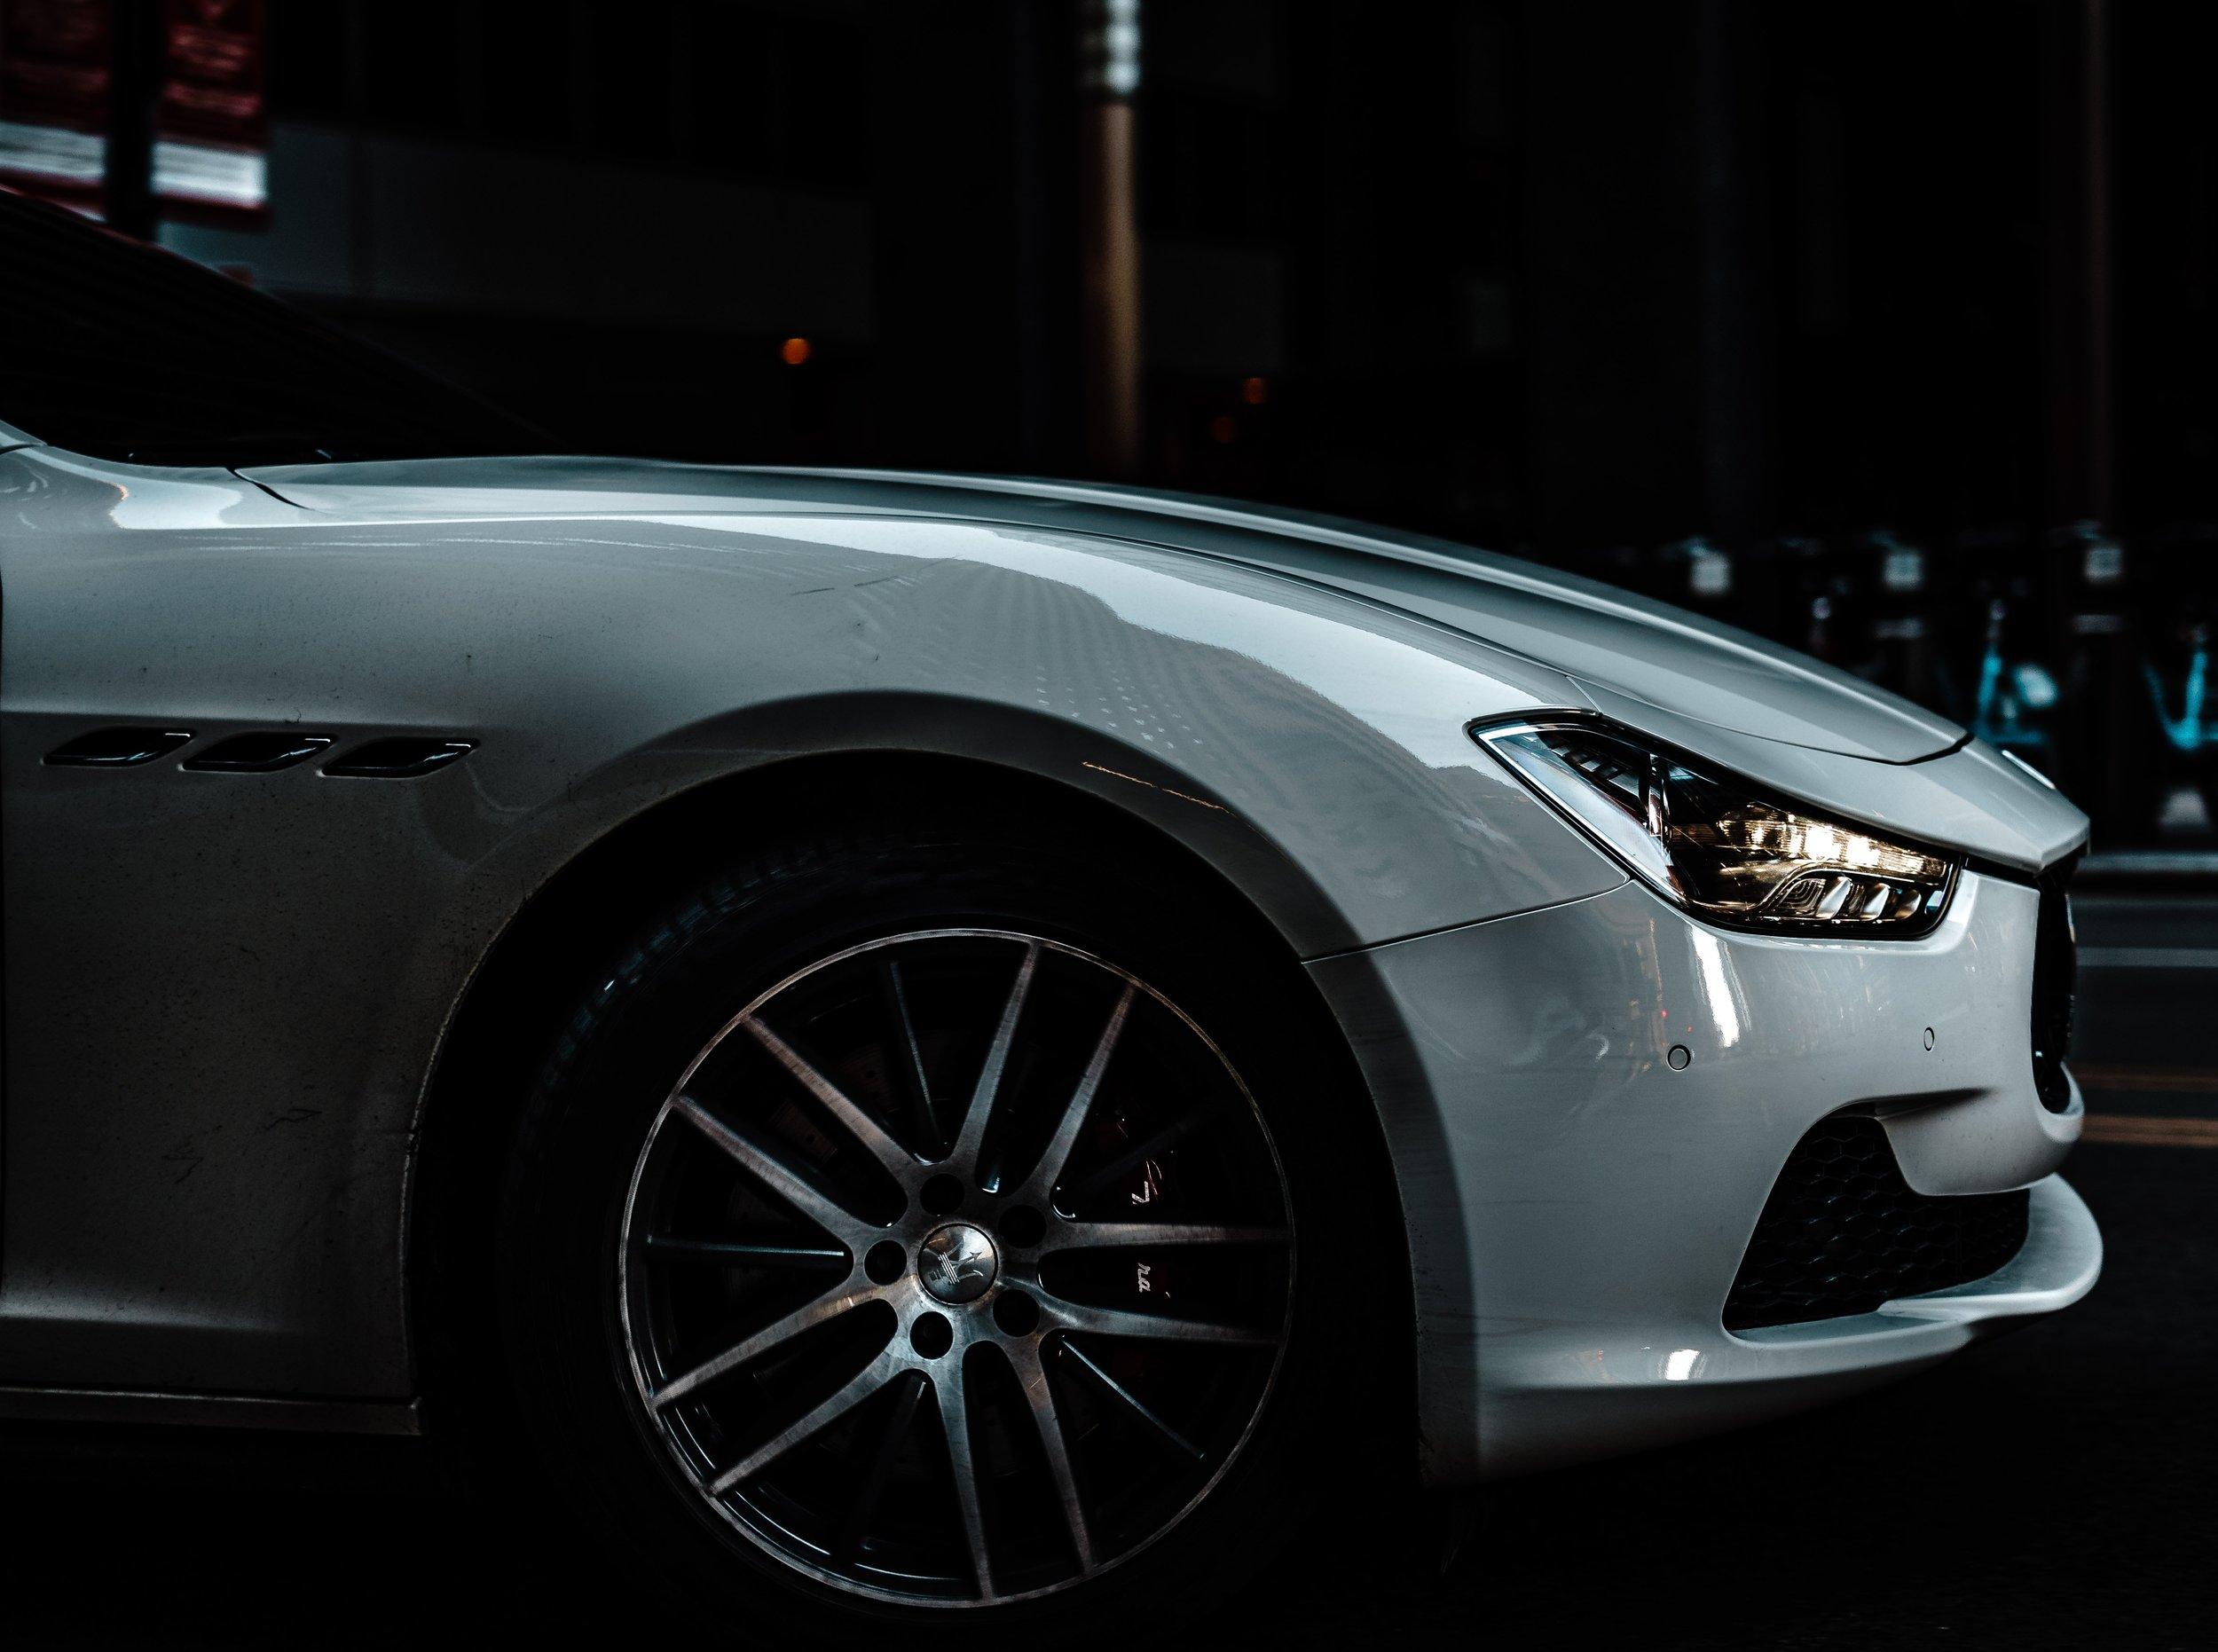 4k-wallpaper-alloy-rim-automobile-1236710.jpg